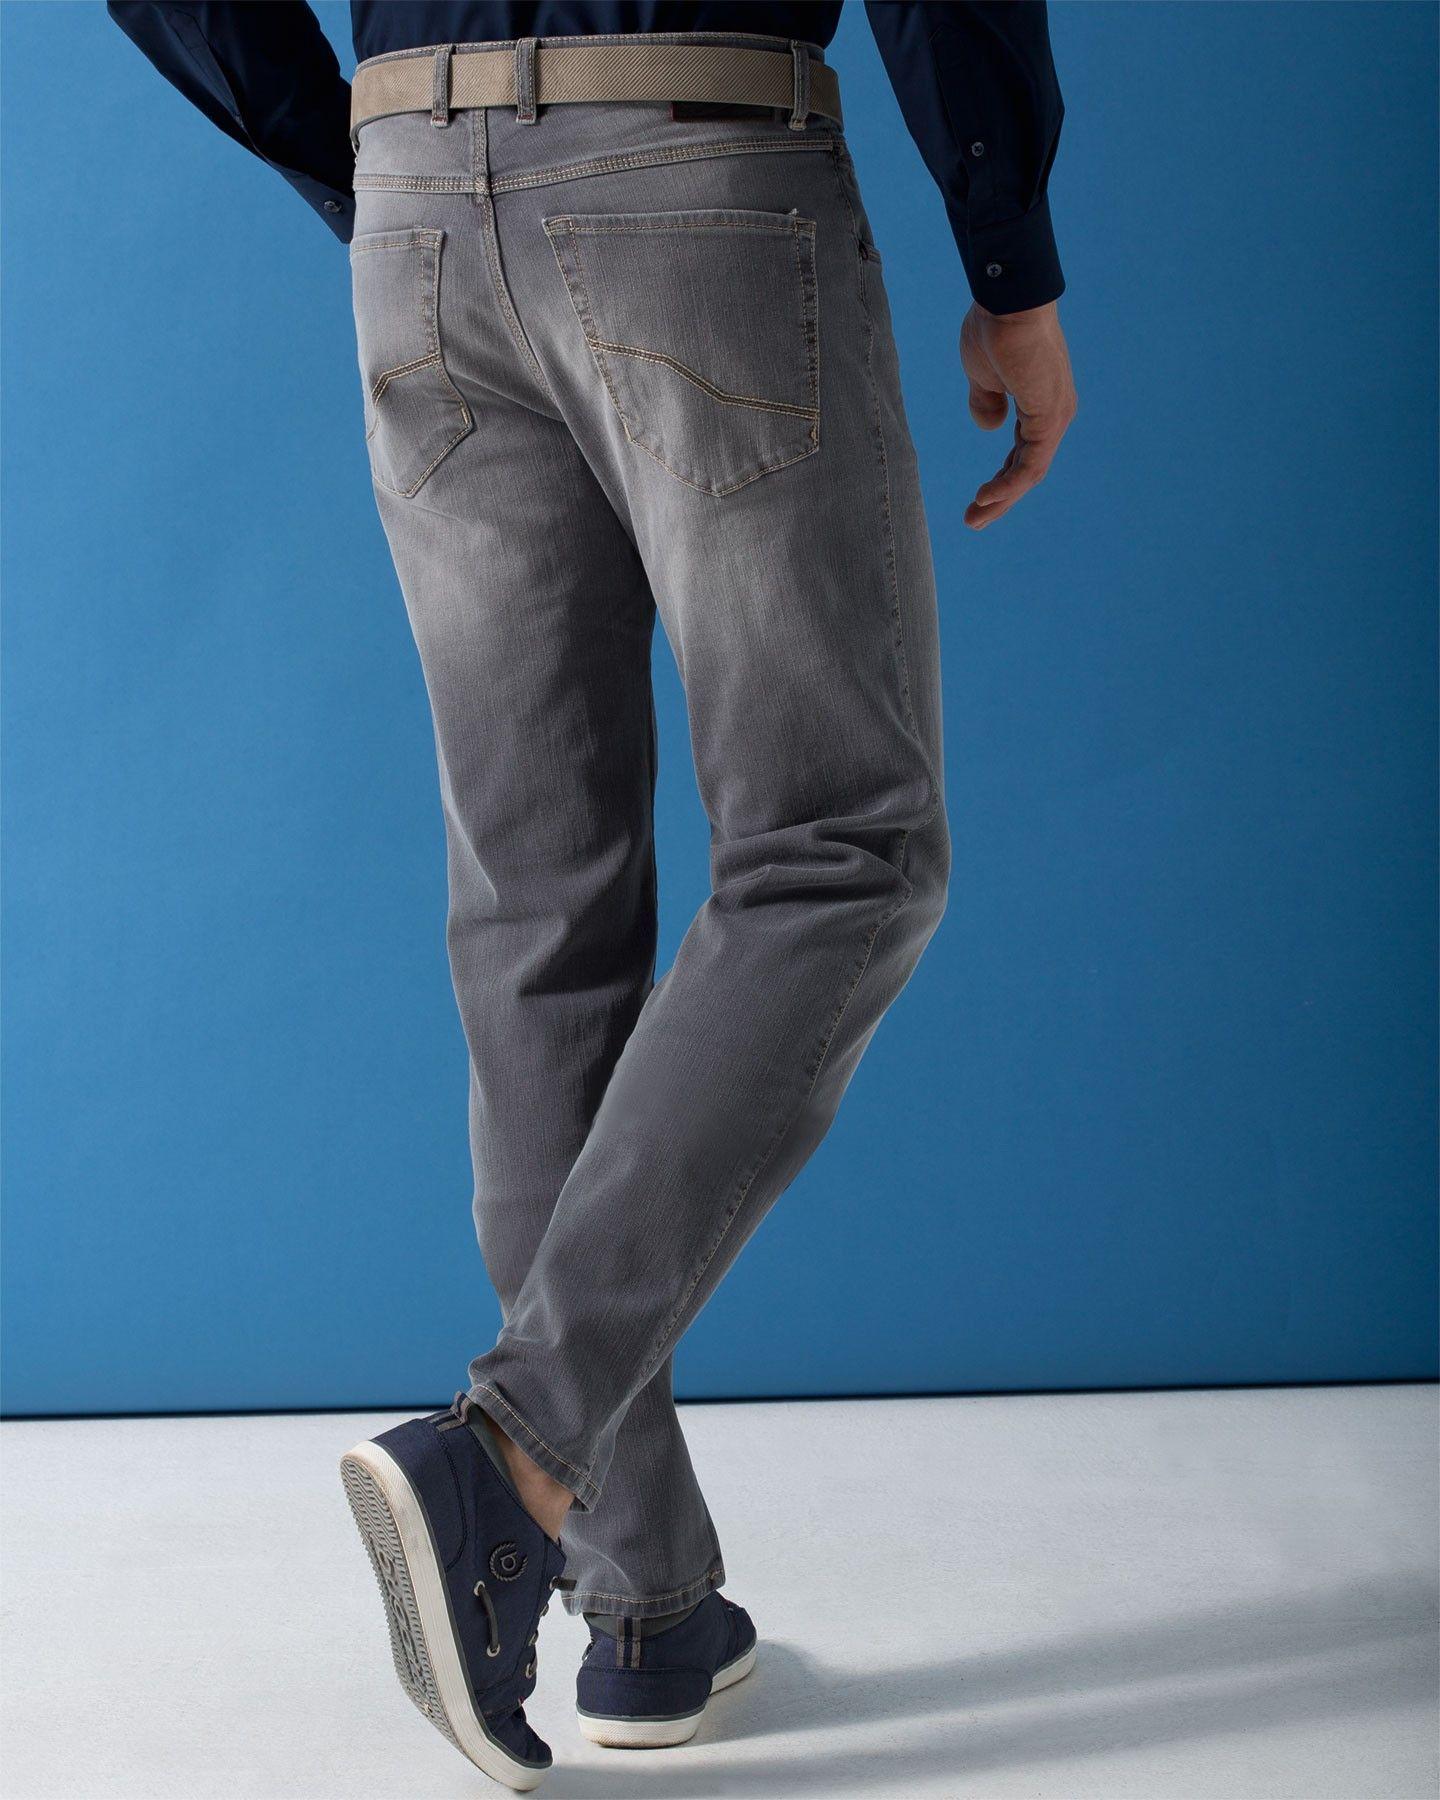 Bugatti - Herren Jeans  (Art. Nr.: 3038D-86676) – Bild 4